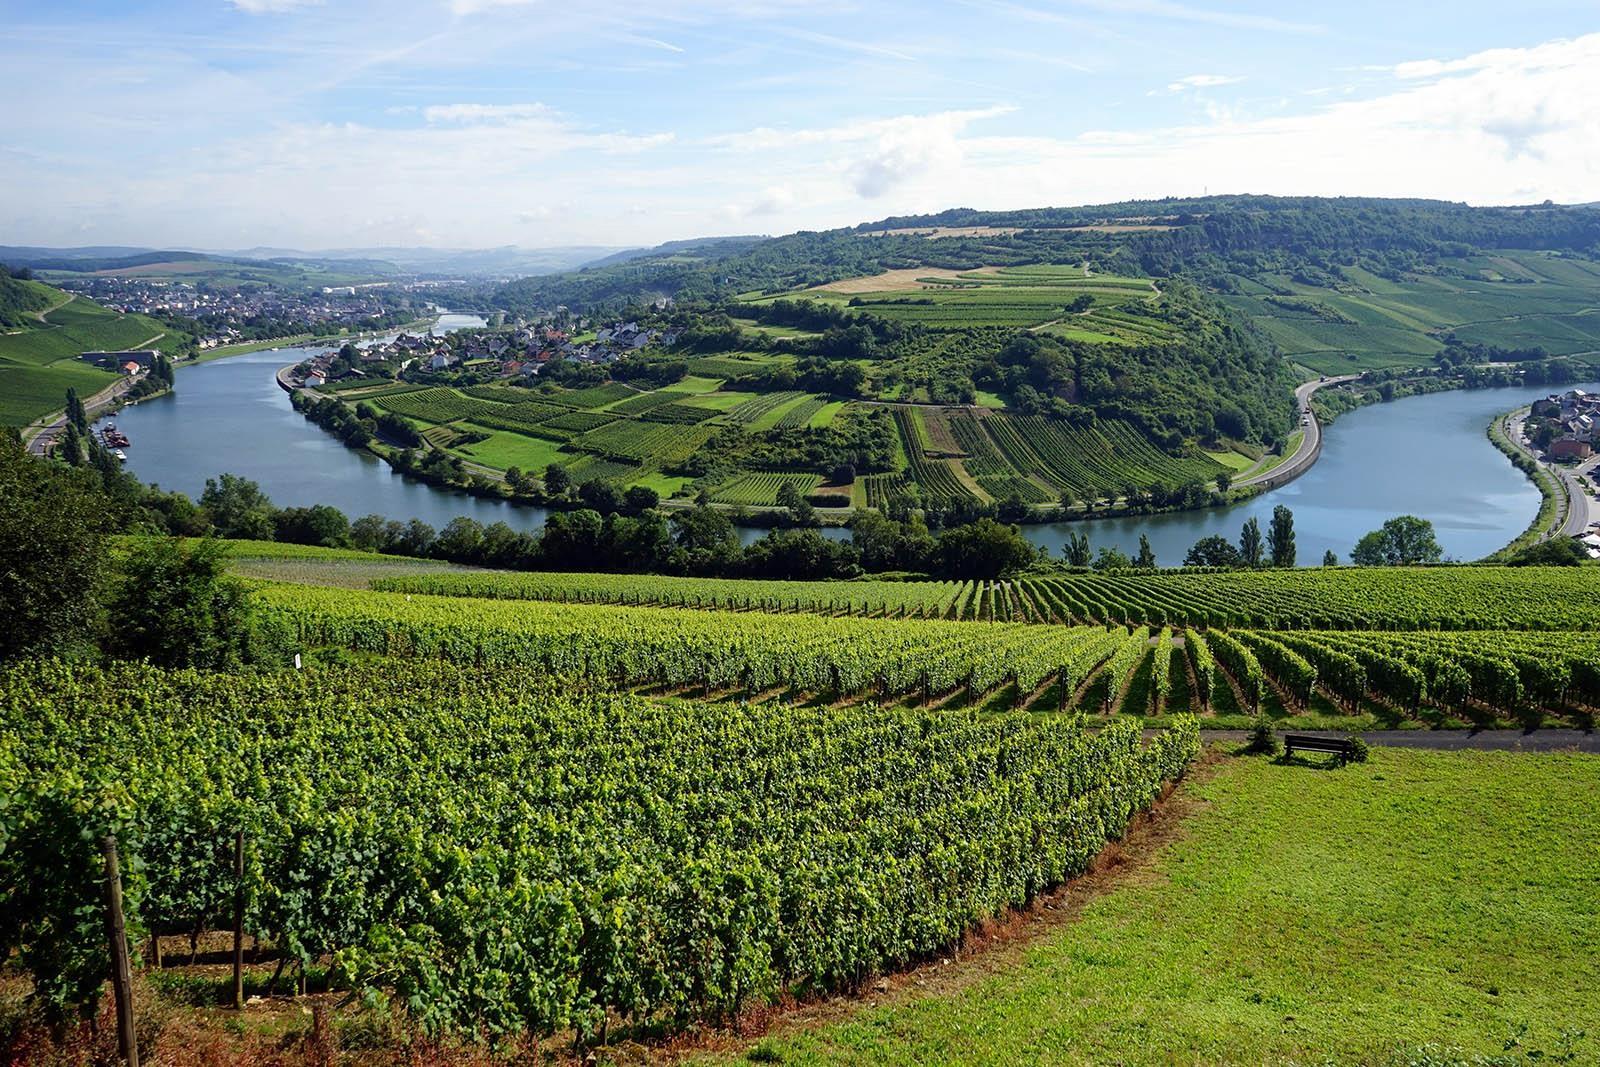 Luxemburg van A(lize) tot Z(oet) | Maidenproeverij